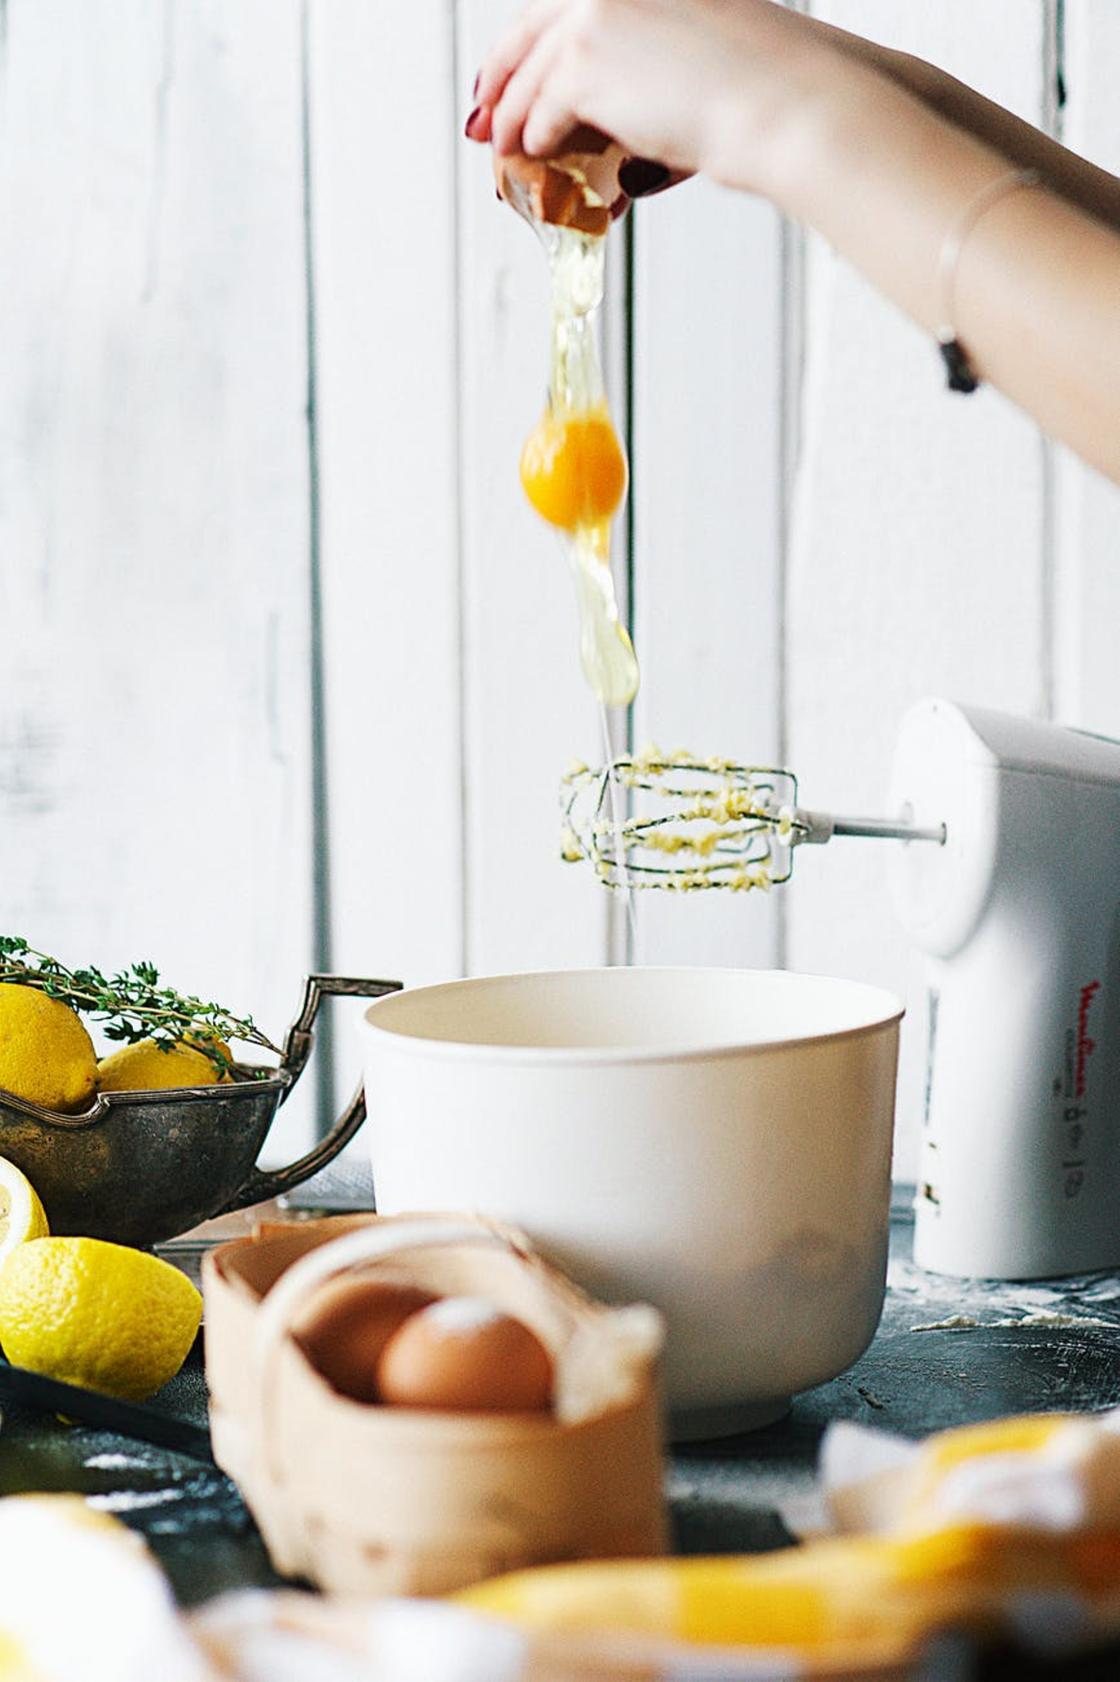 Торт «Вупи пай»: рецепт в домашних условиях